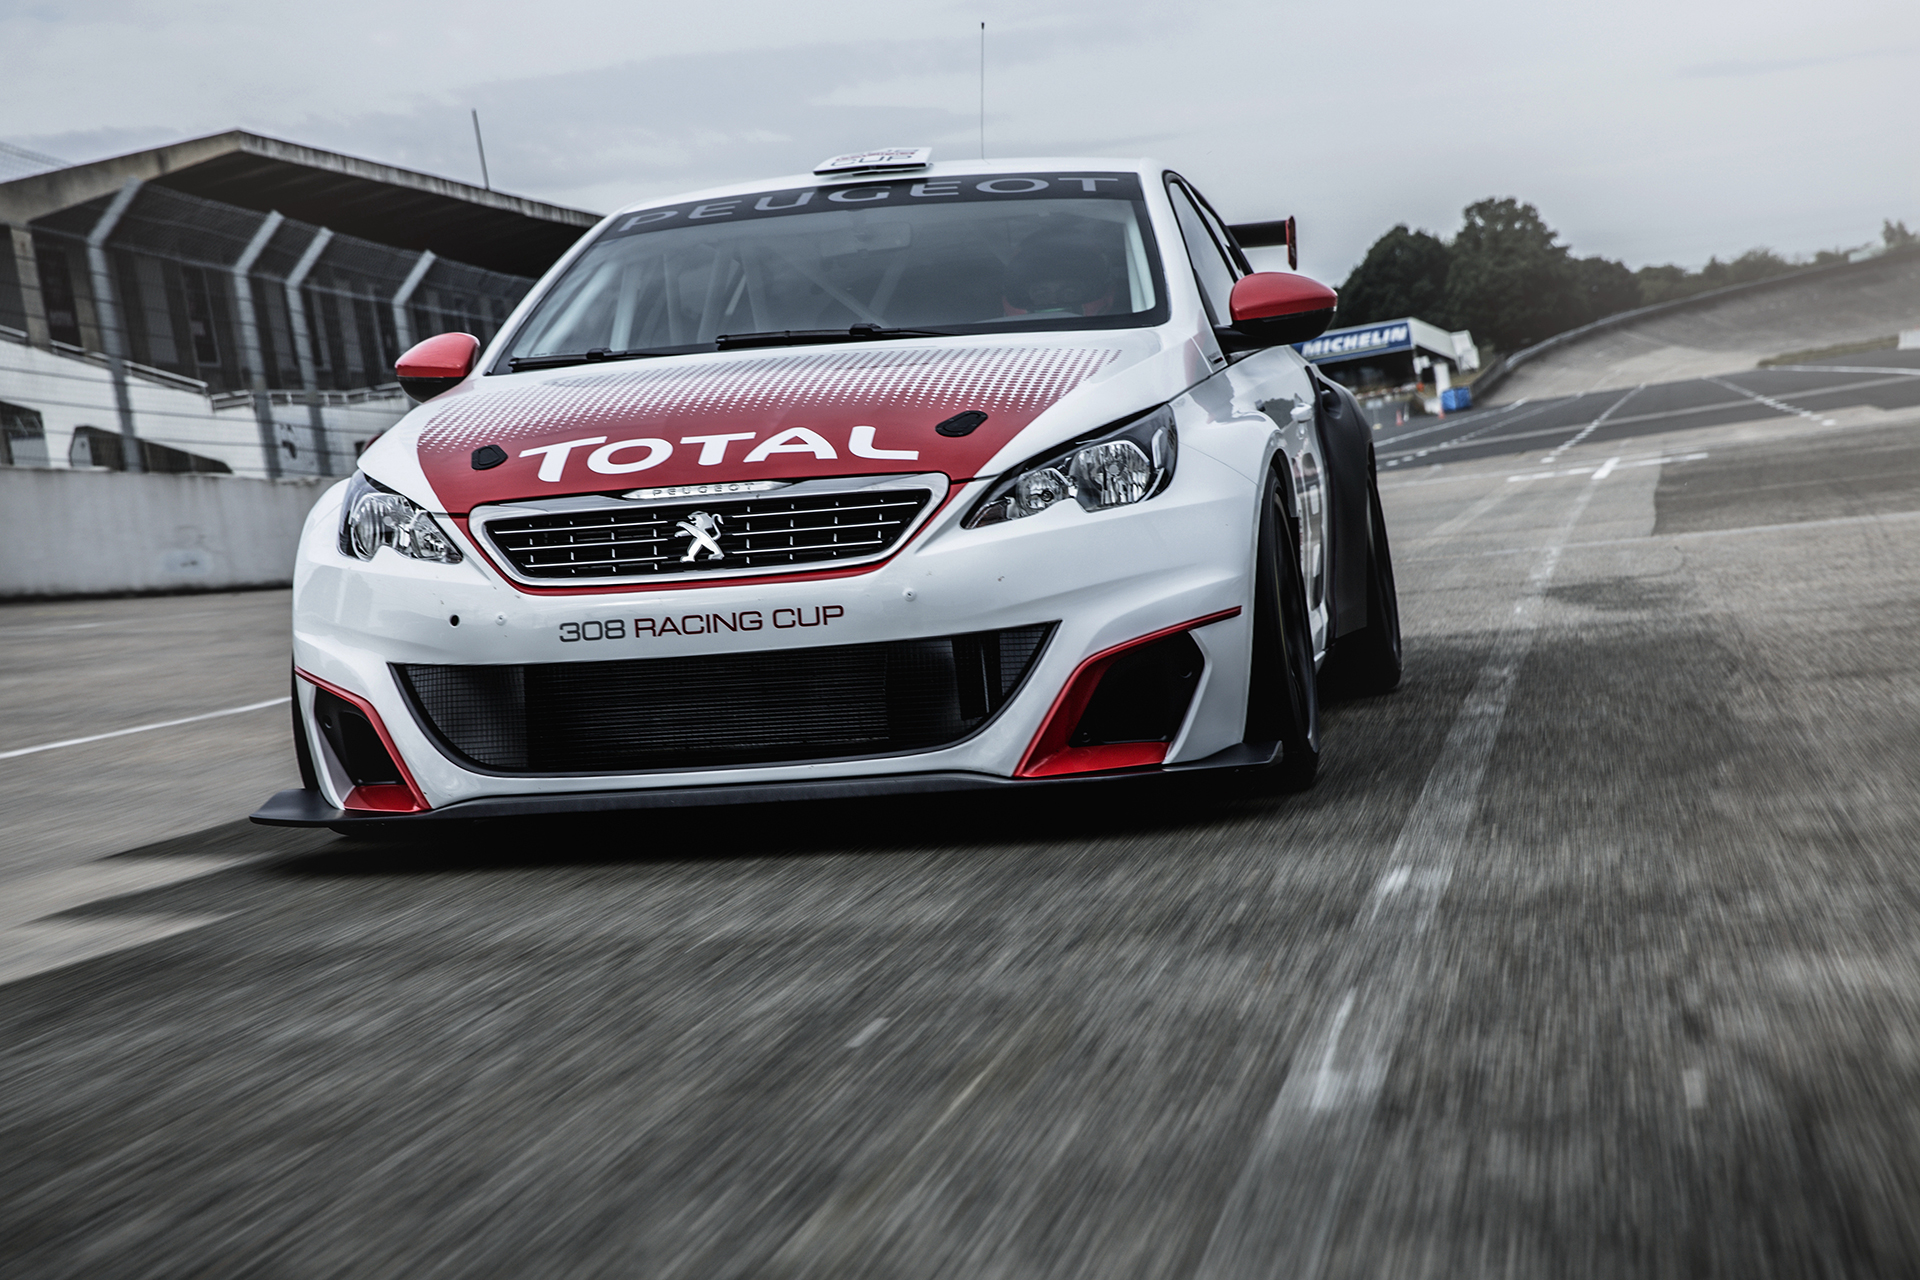 Peugeot 308 Racing Cup - 2015 - avant / front